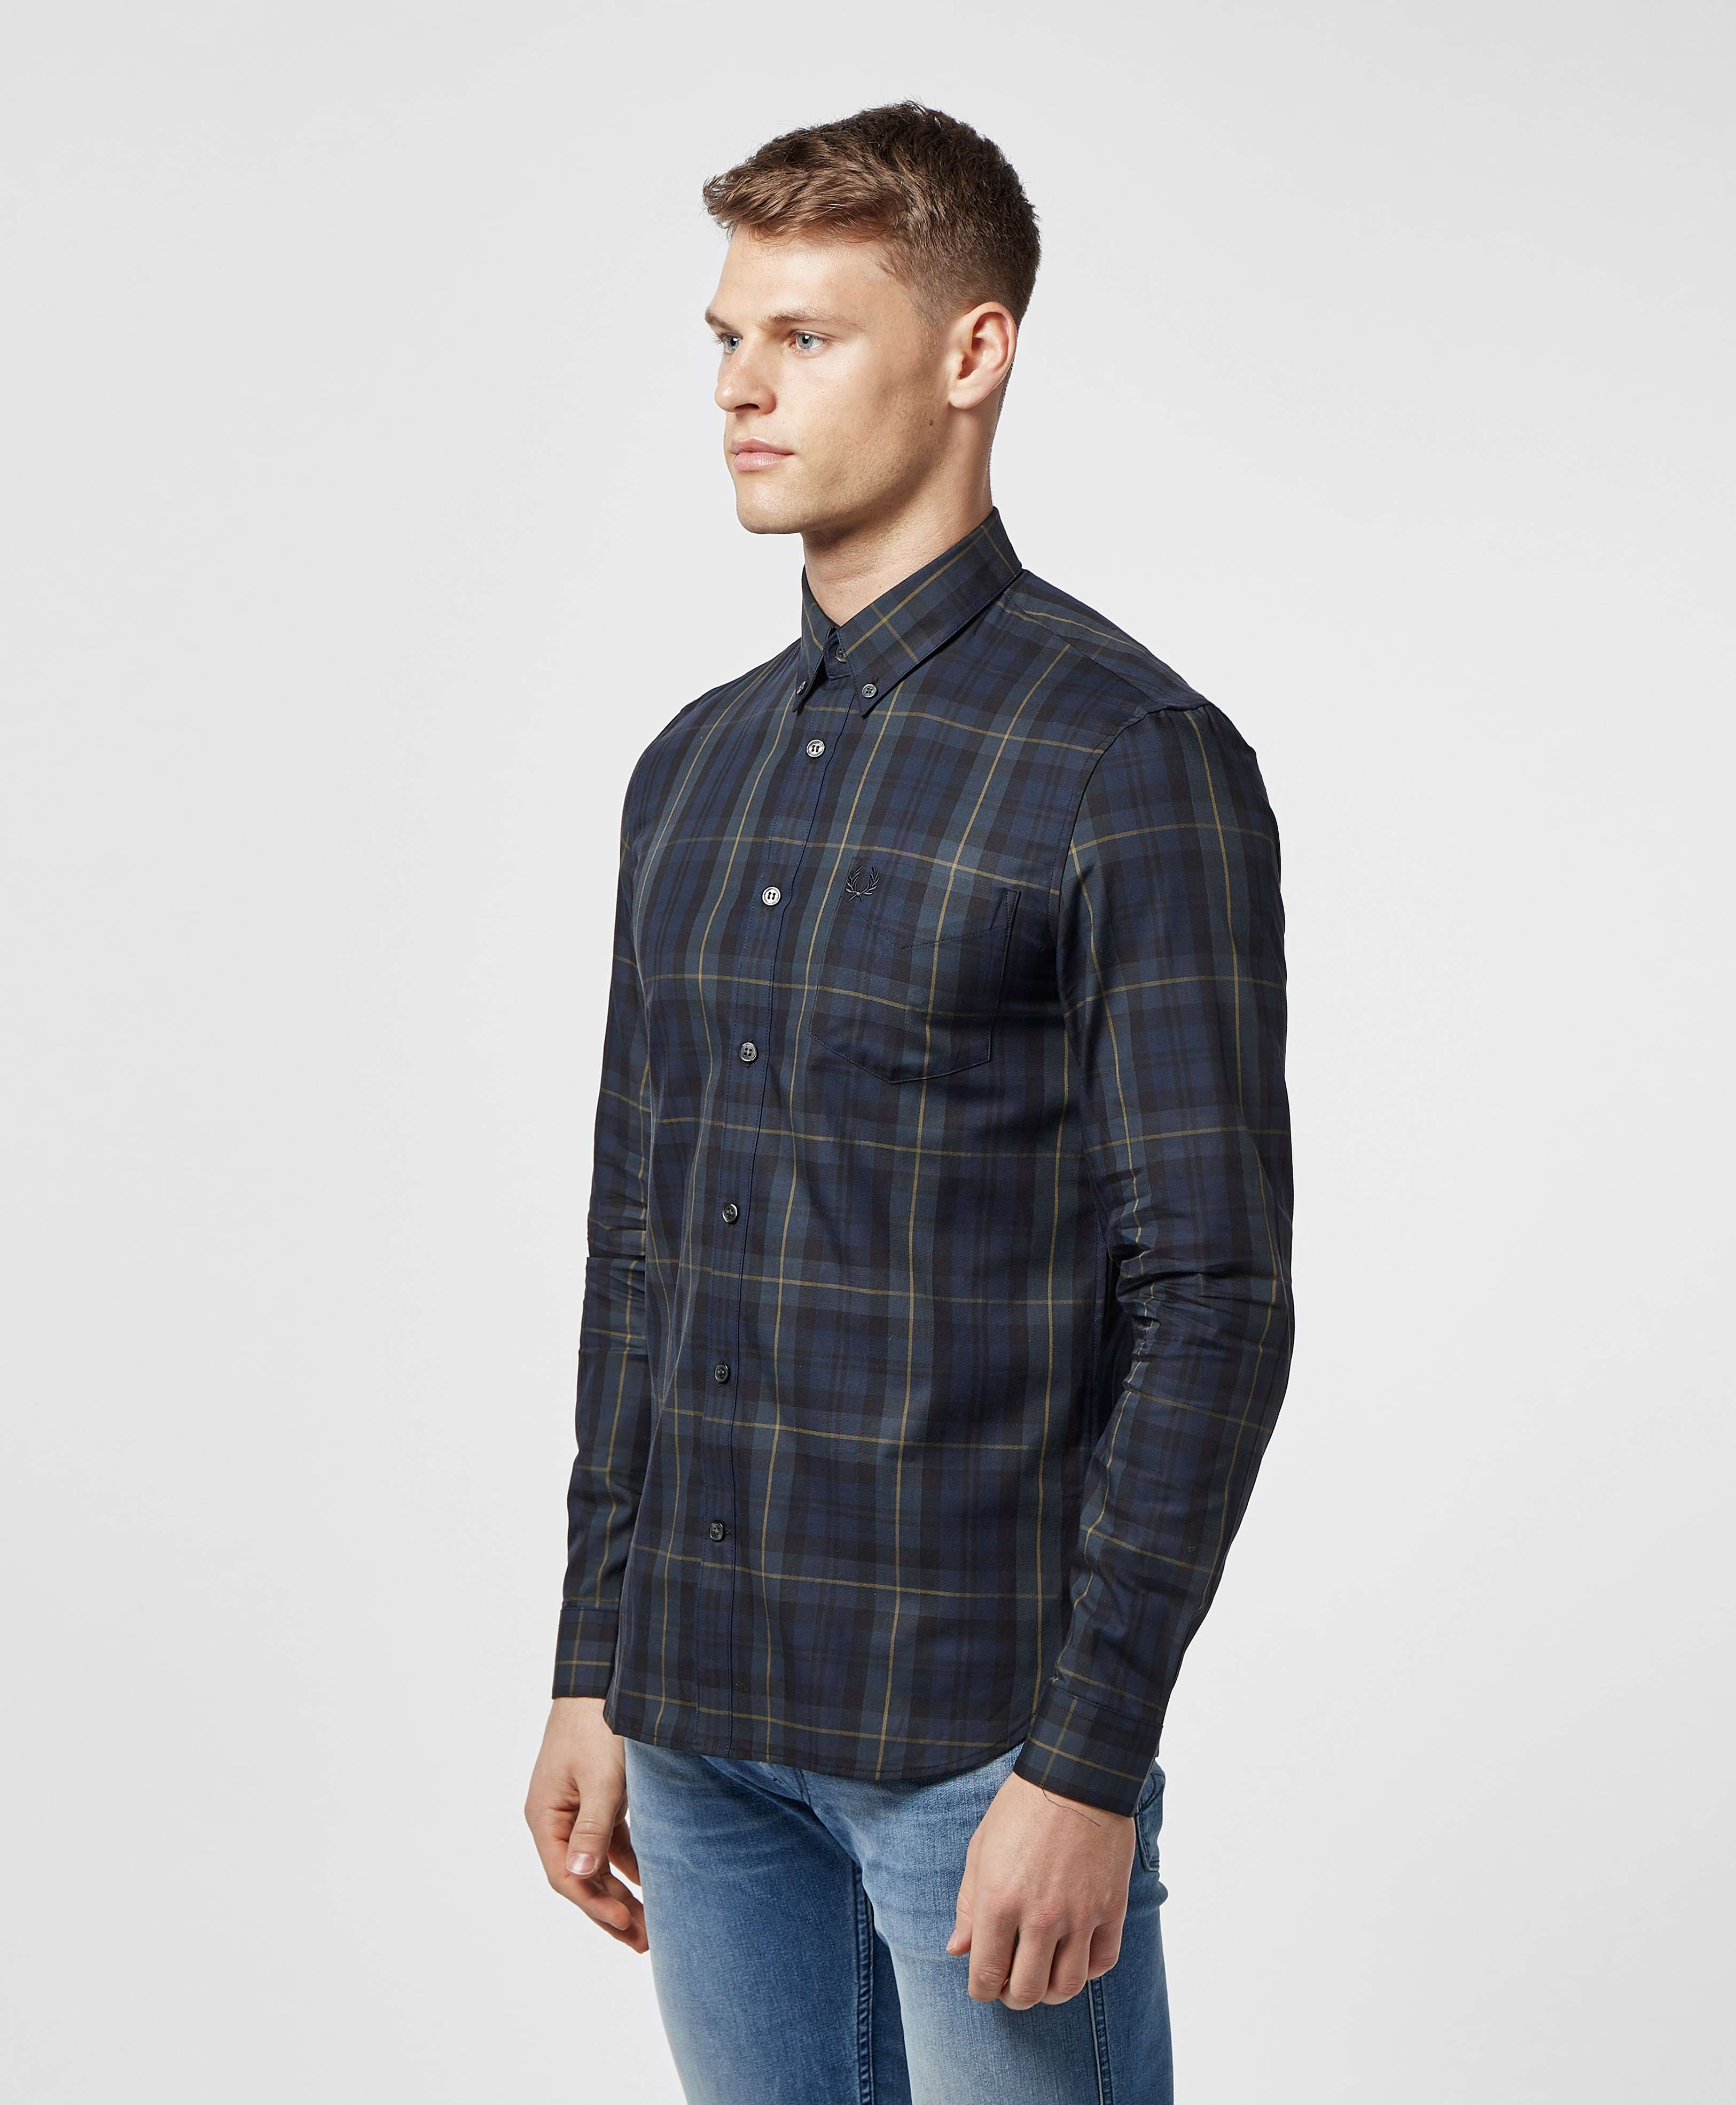 Fred Perry Contrast Tartan Long Sleeve Shirt